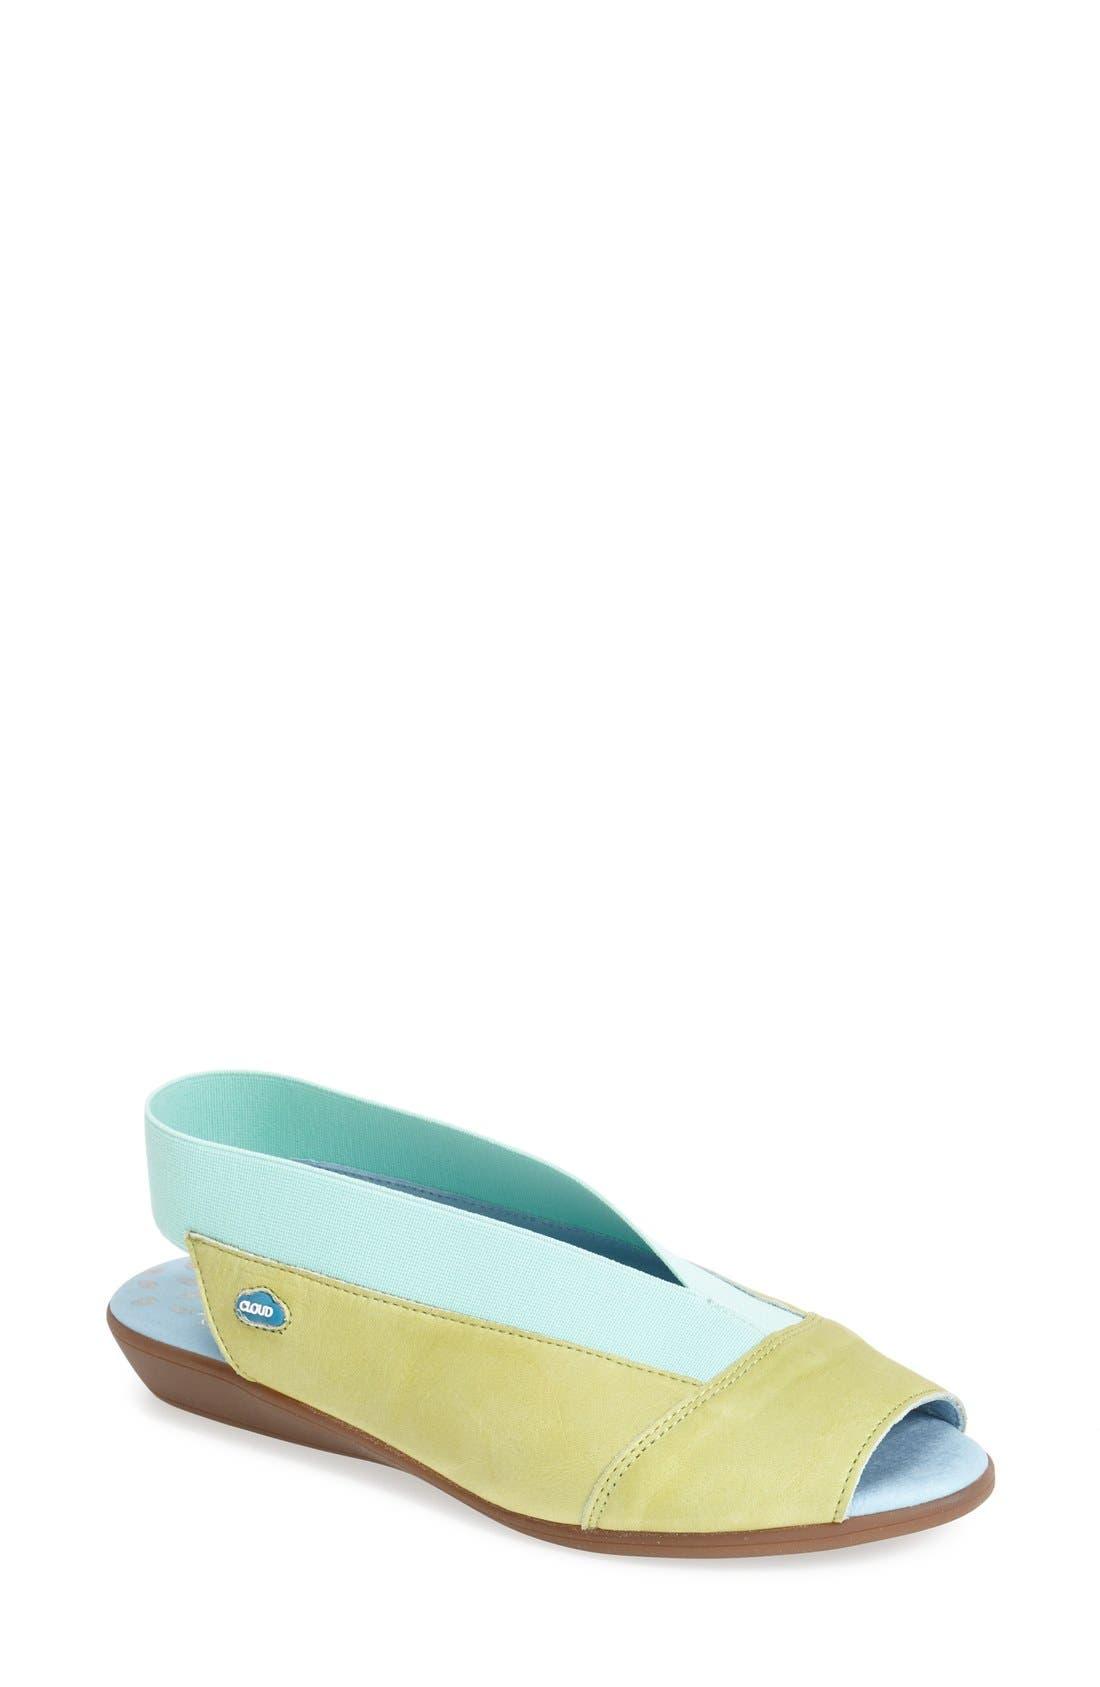 Alternate Image 1 Selected - CLOUD 'Caliber' Peep Toe Leather Flat (Women)